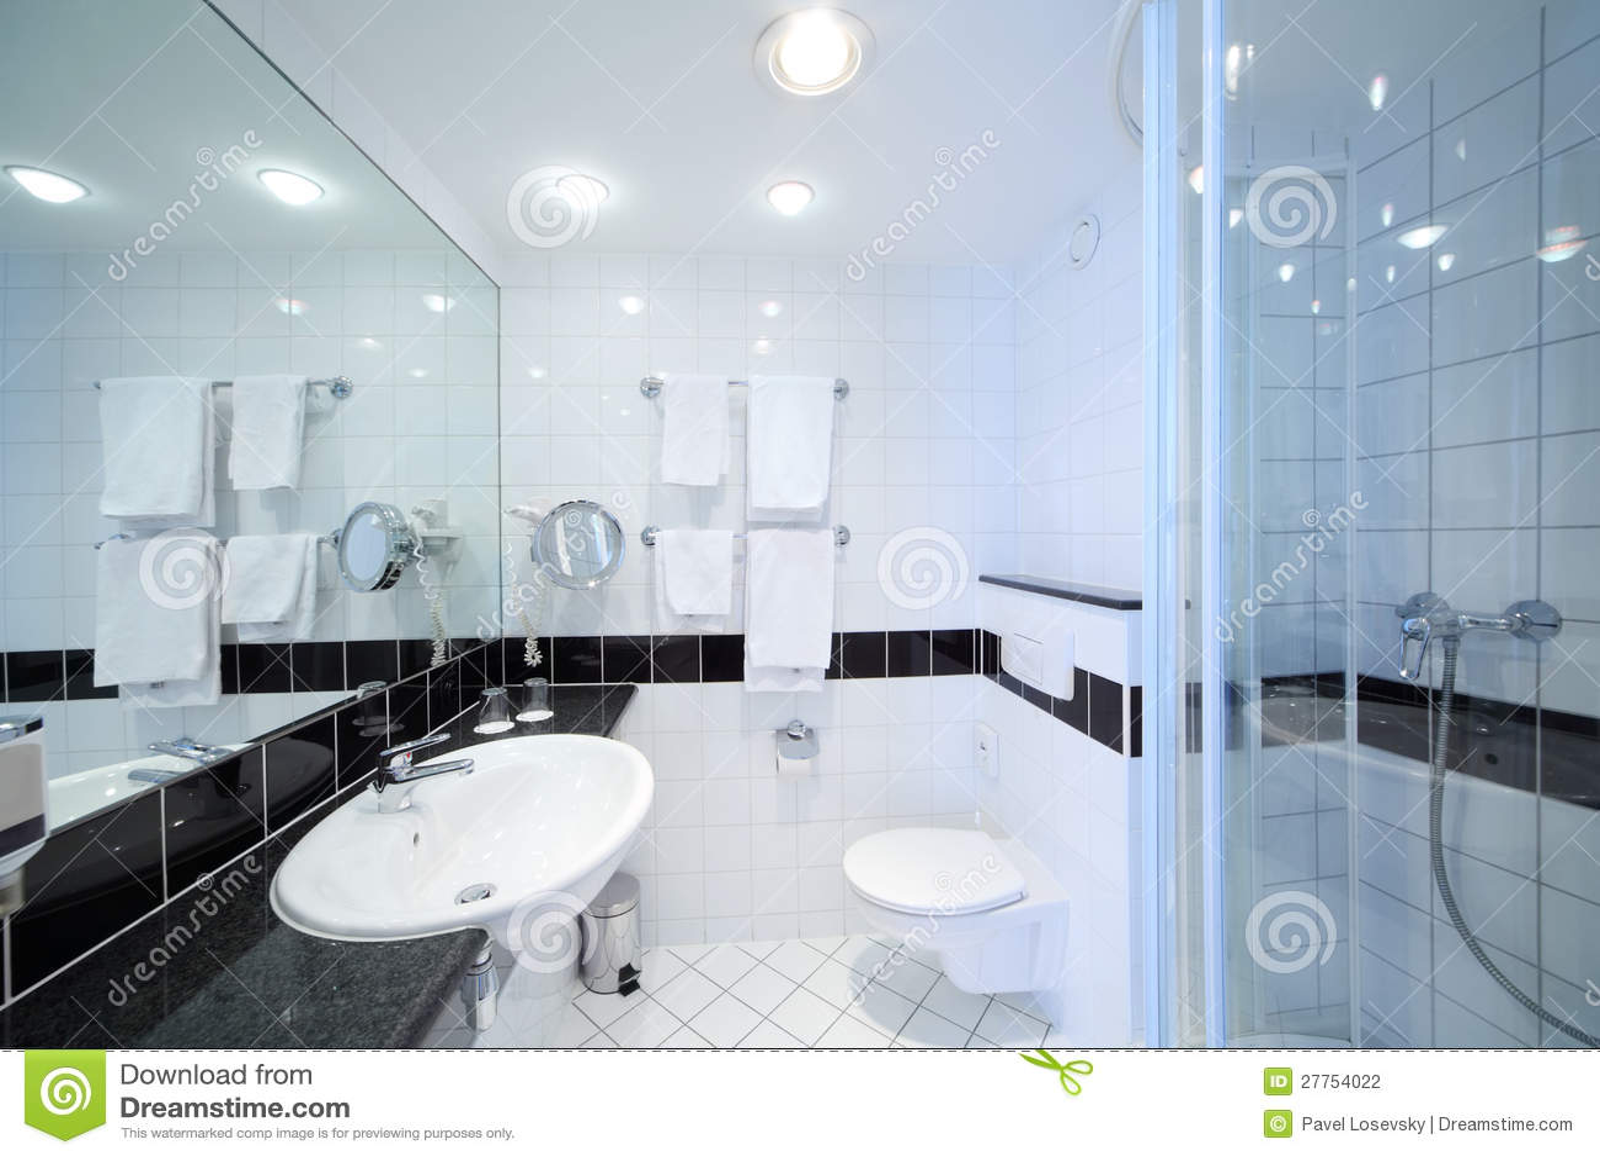 Modieuze moderne badkamers stock foto afbeelding bestaande uit eigentijds 27754022 for Moderne badkamers